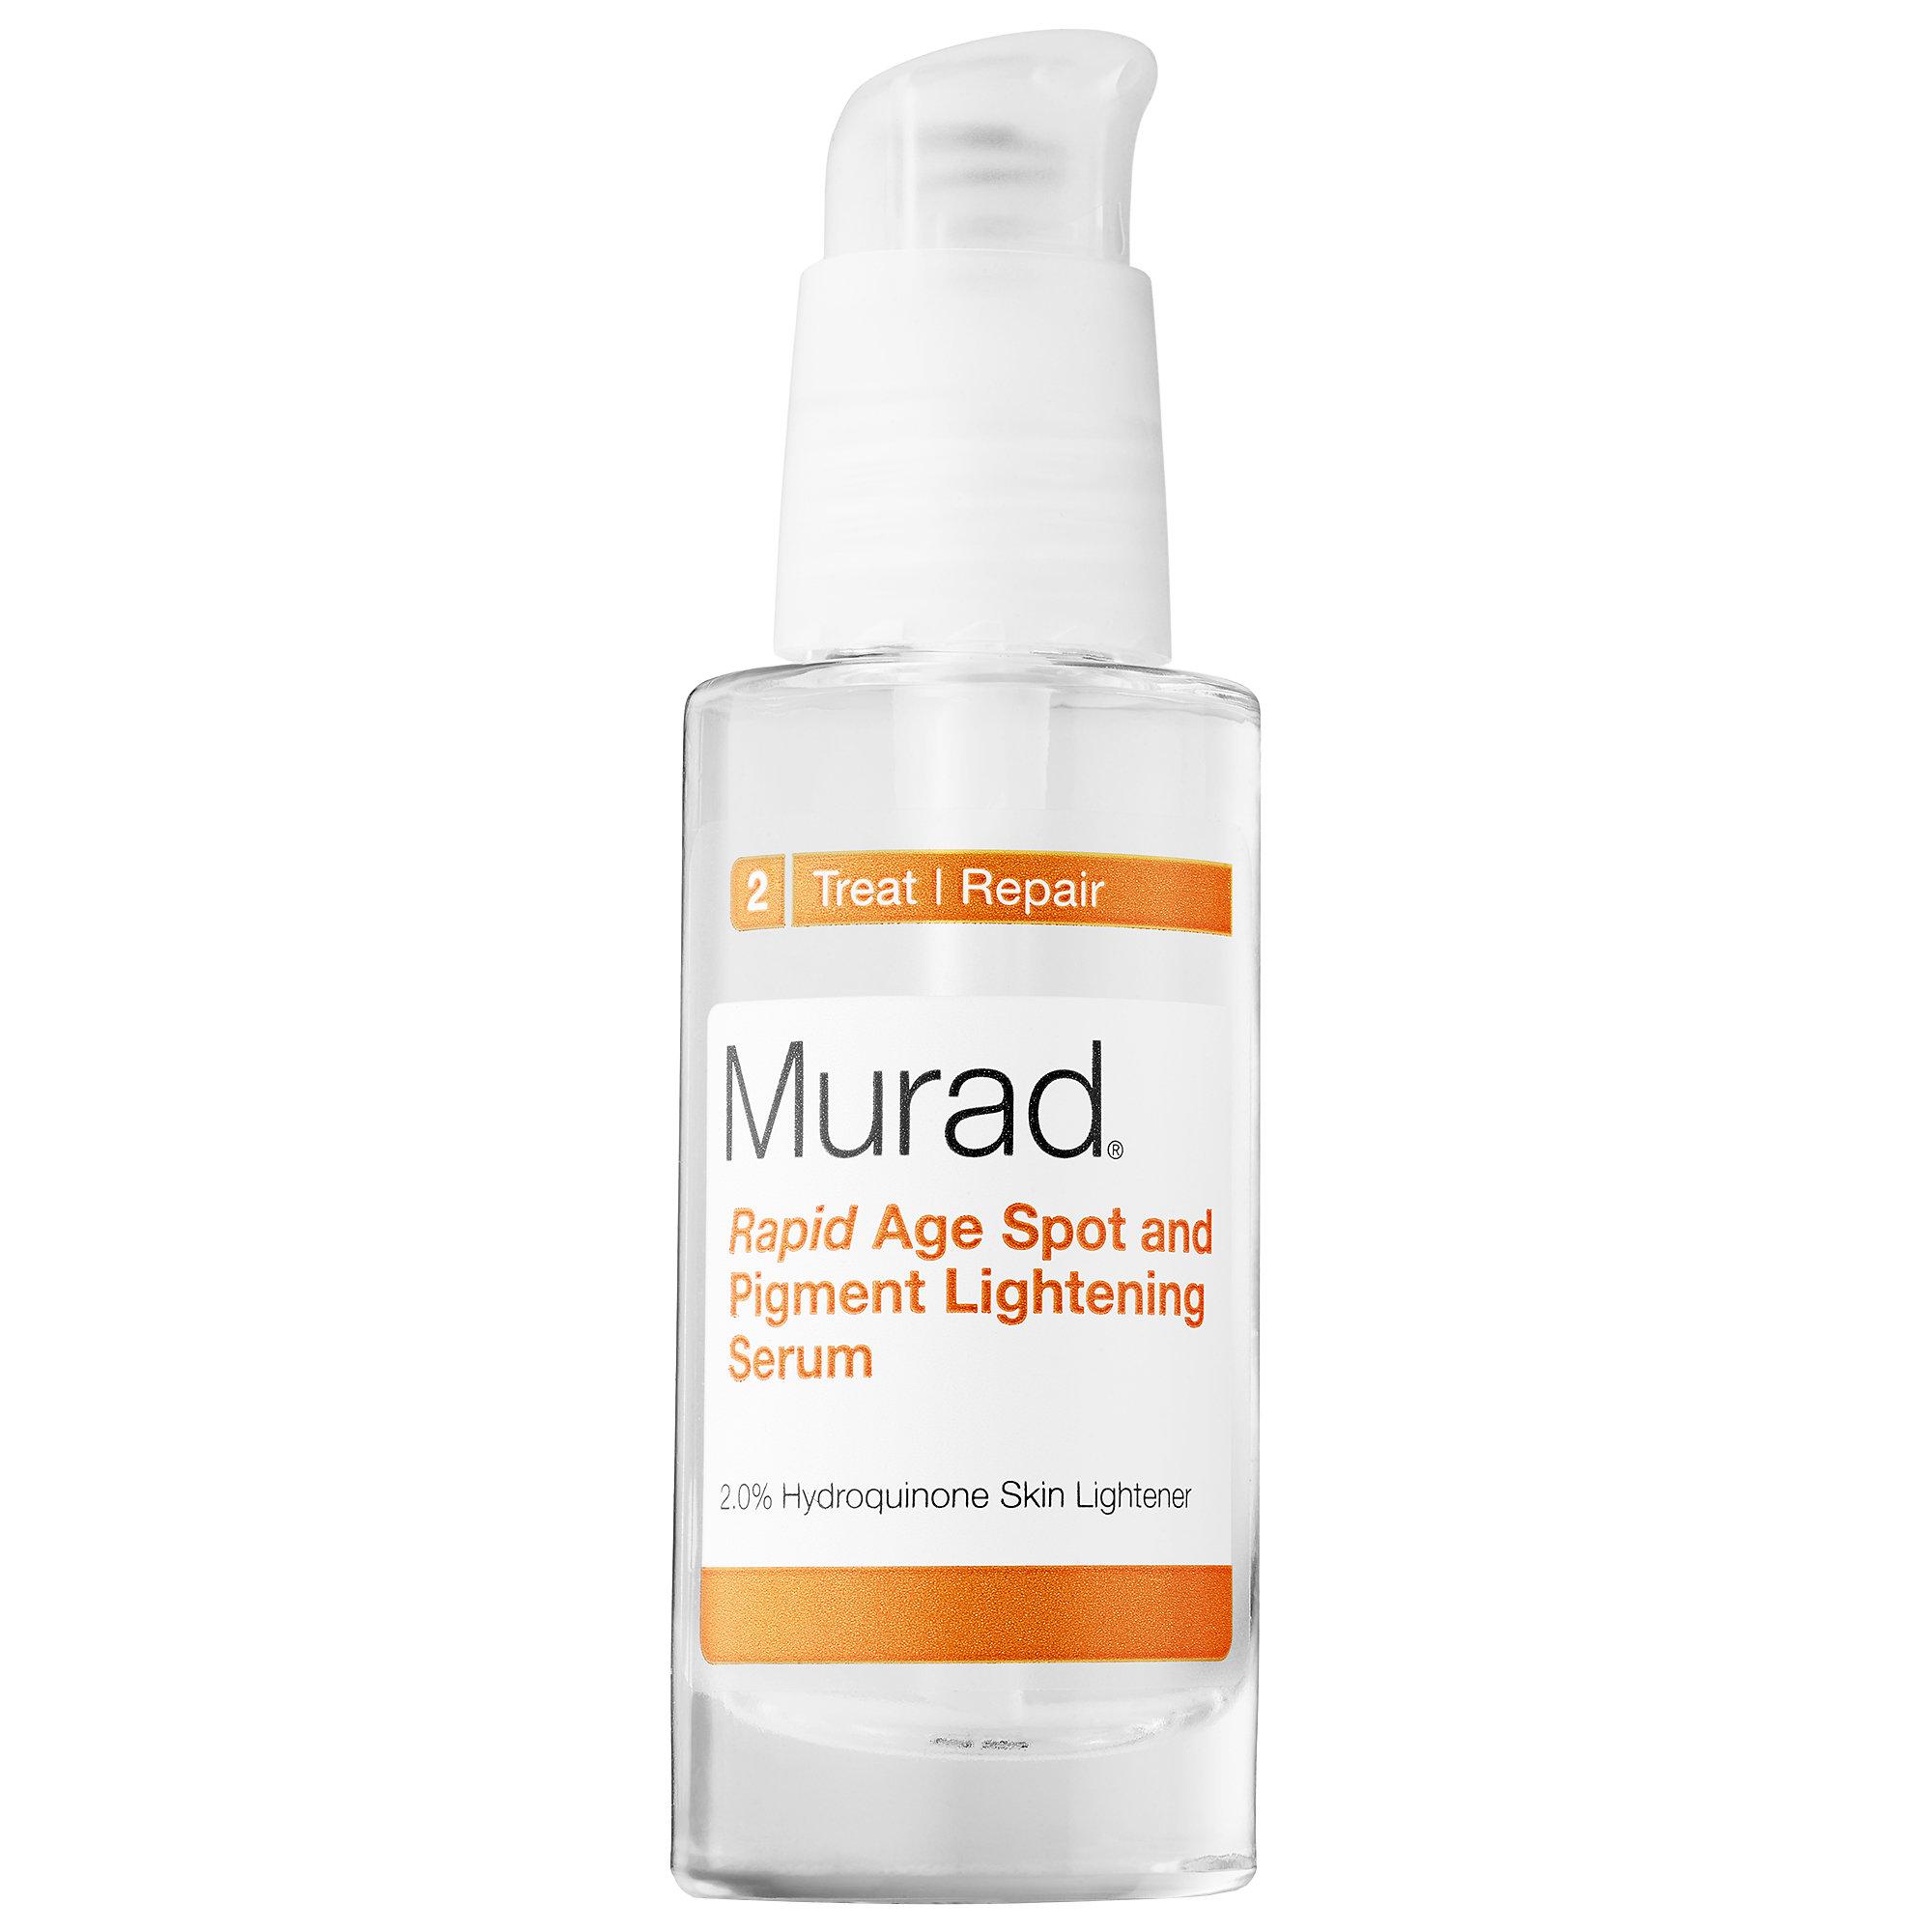 murad-rapid-age-spot-serum